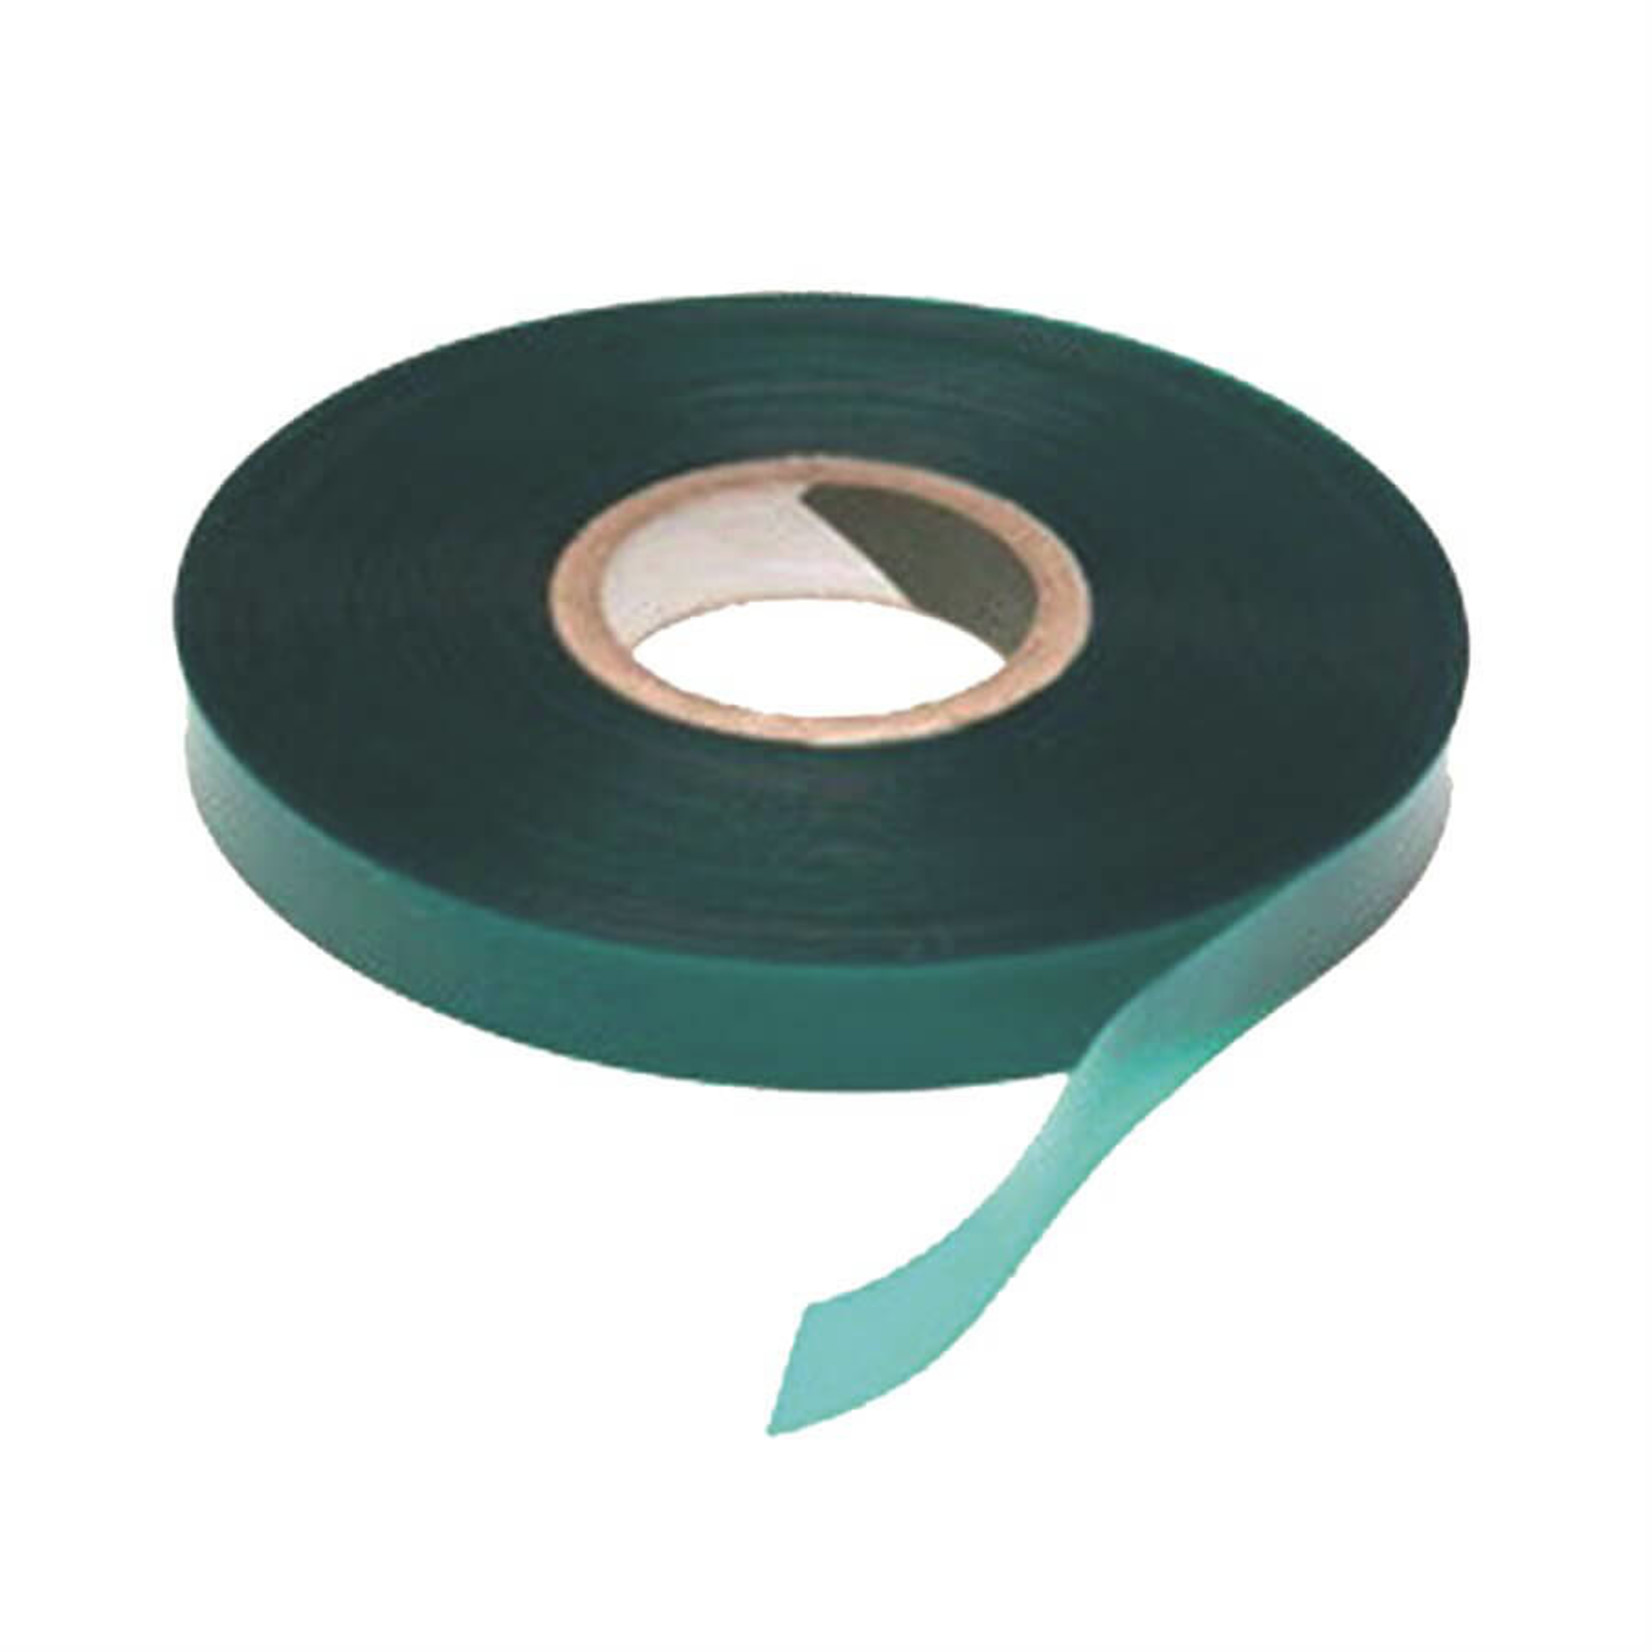 Gro1 Gro1 Tie Tape 1 / 2'' x 60' (5 / Pk)